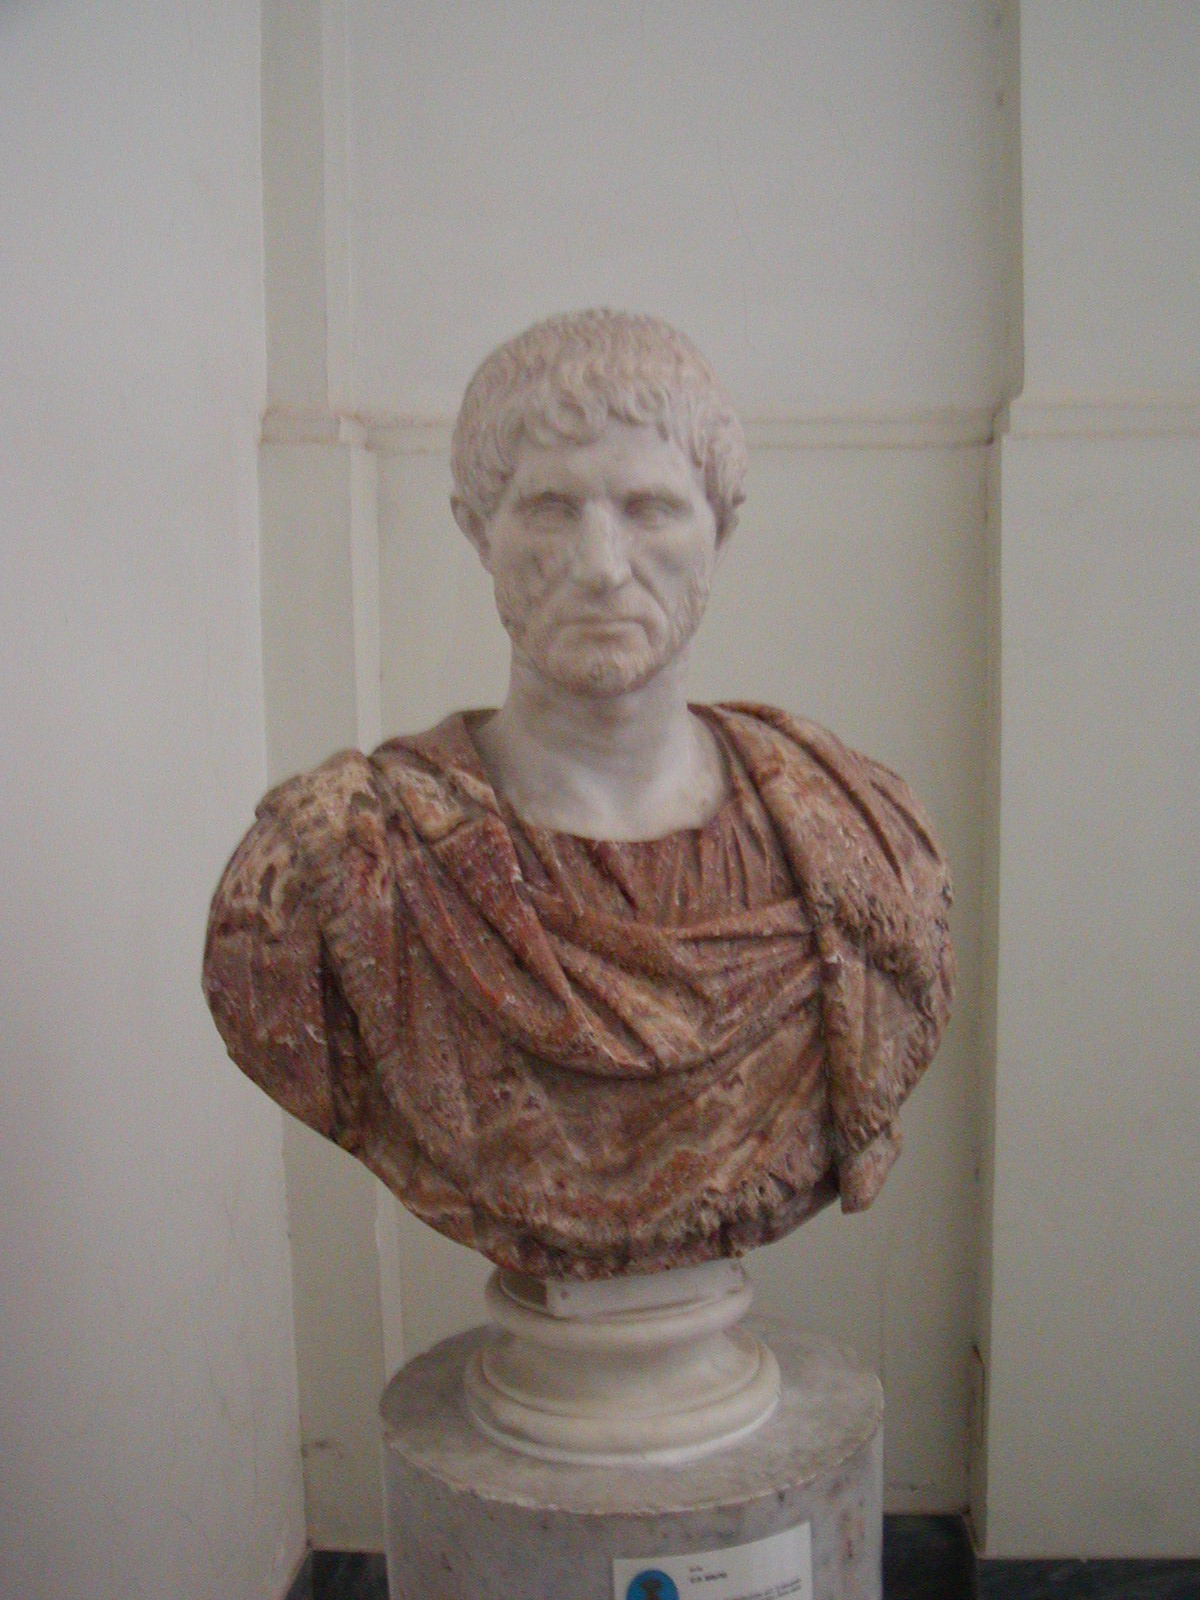 Museo Archeologico Nazionale - 2002-09-13-094522